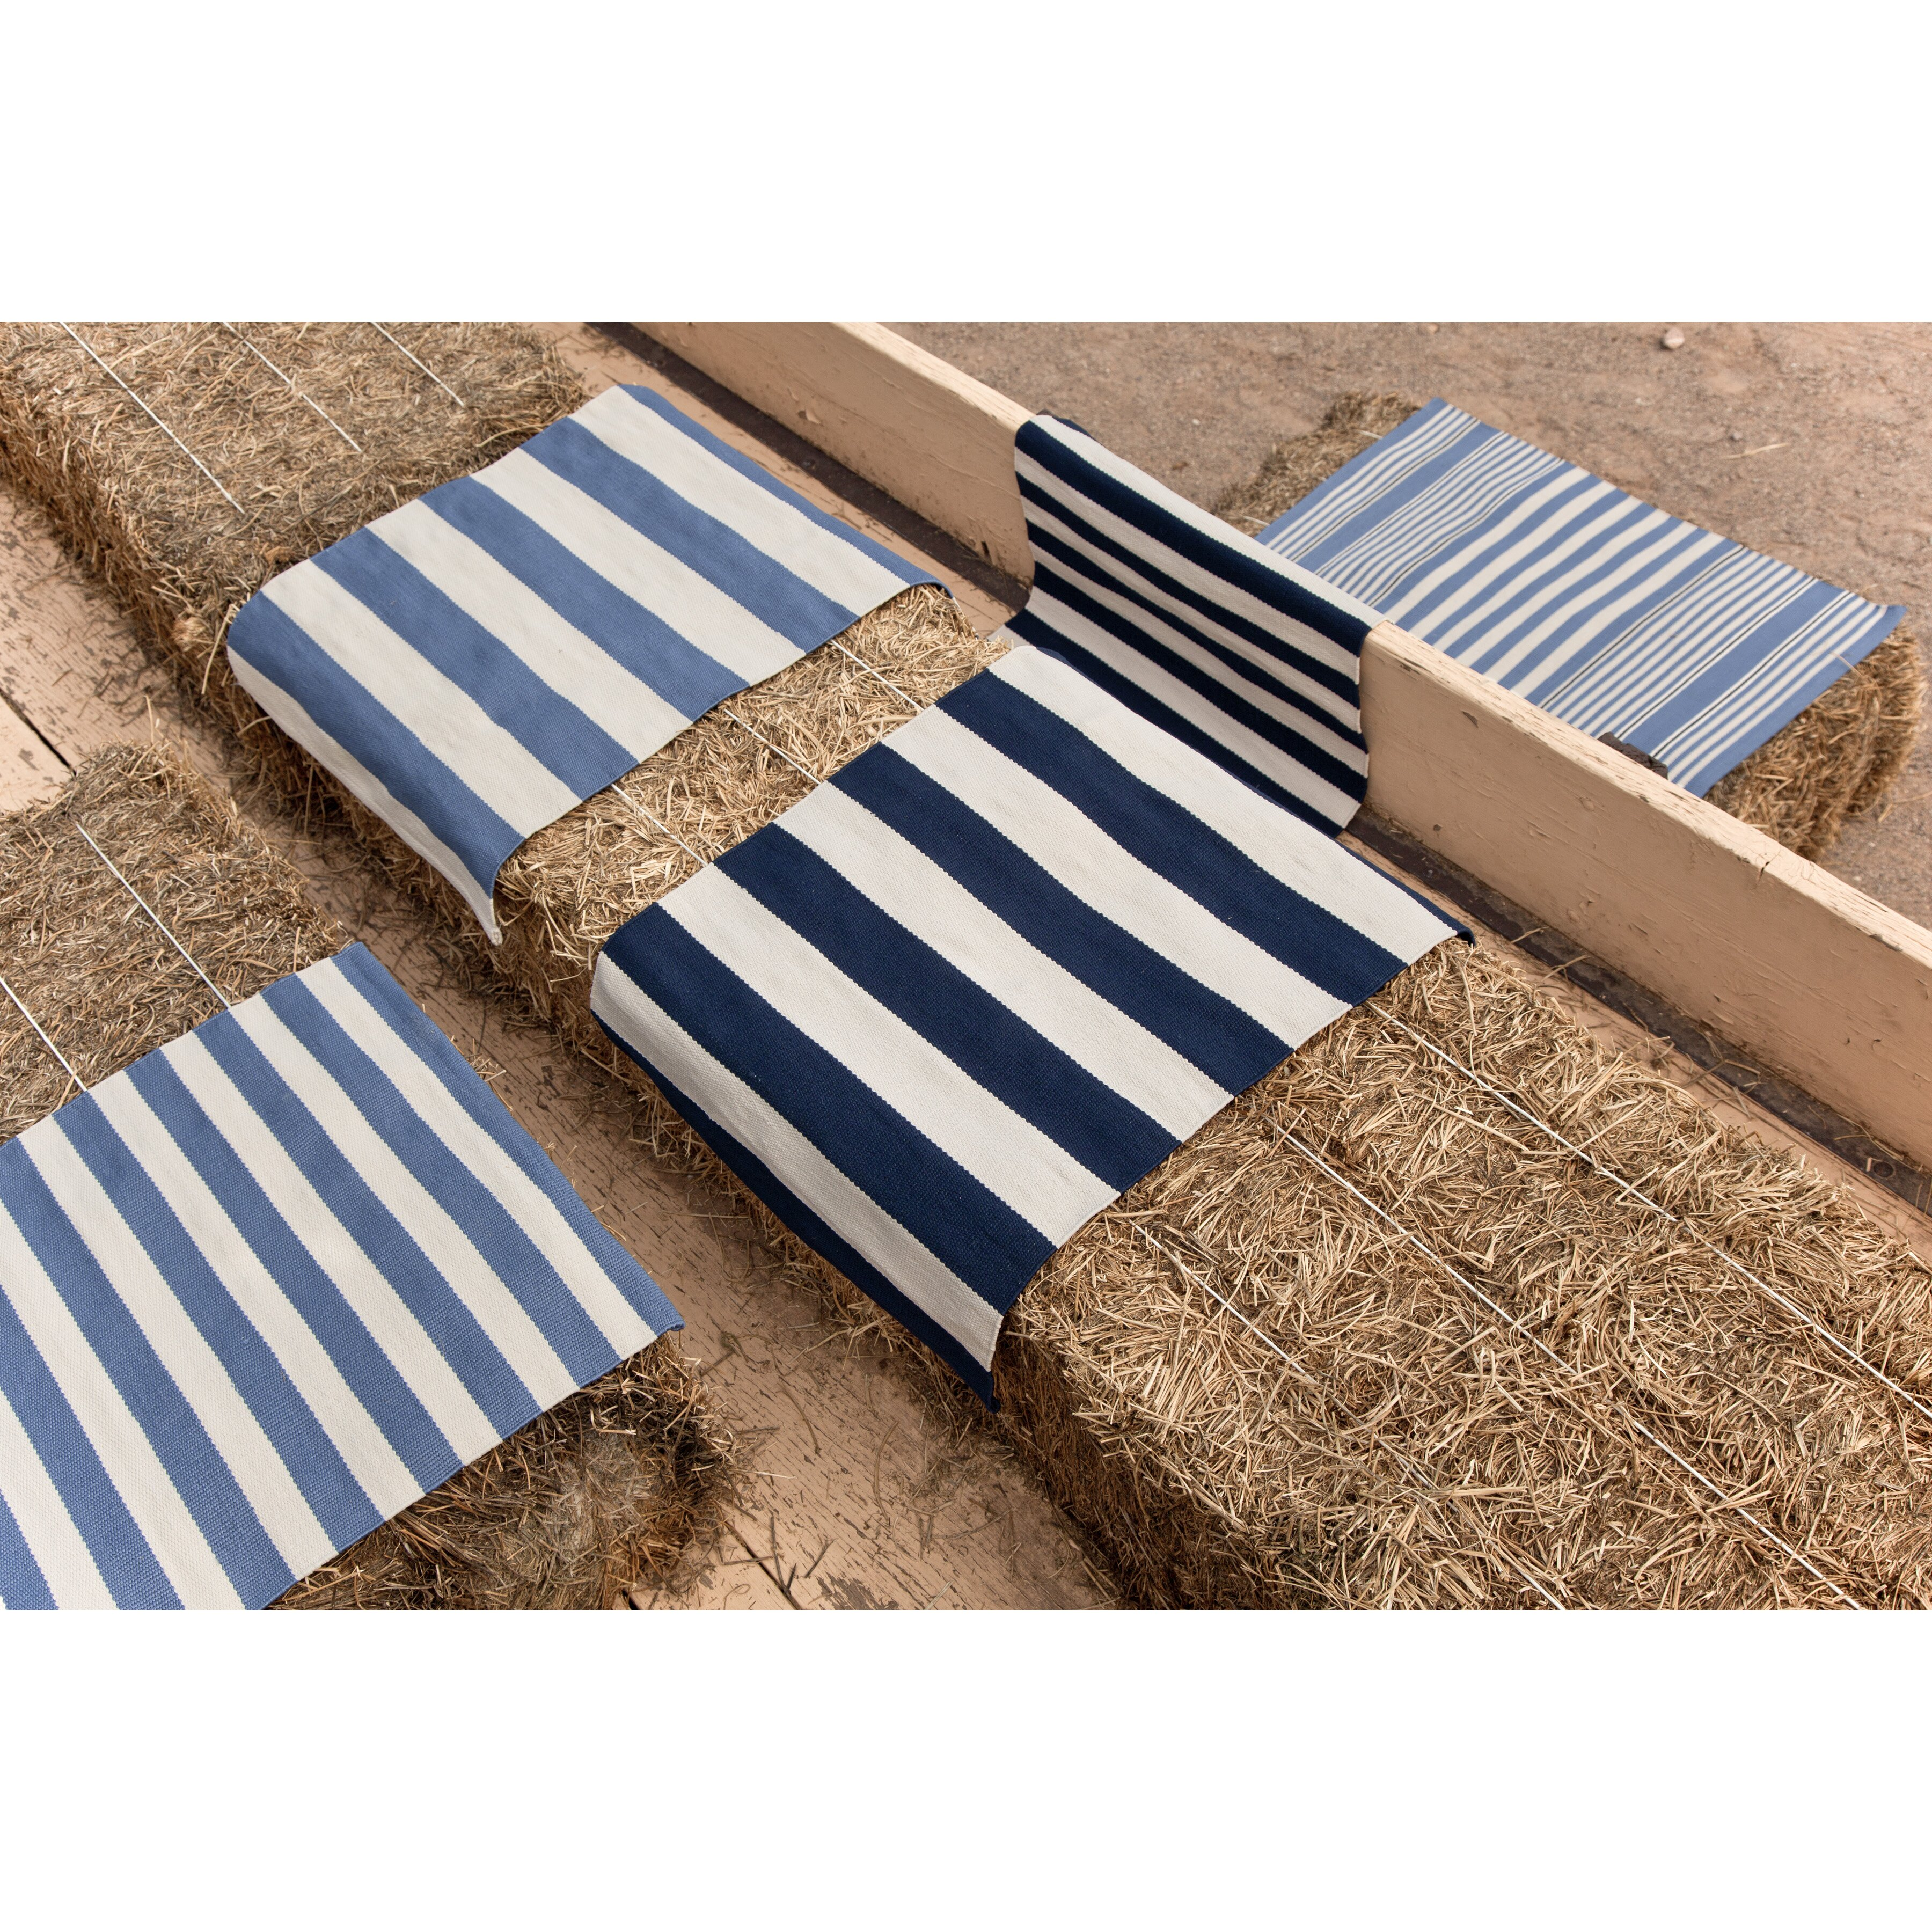 dash and albert rugs catamaran ivory navy striped area rug reviews wayfair supply. Black Bedroom Furniture Sets. Home Design Ideas